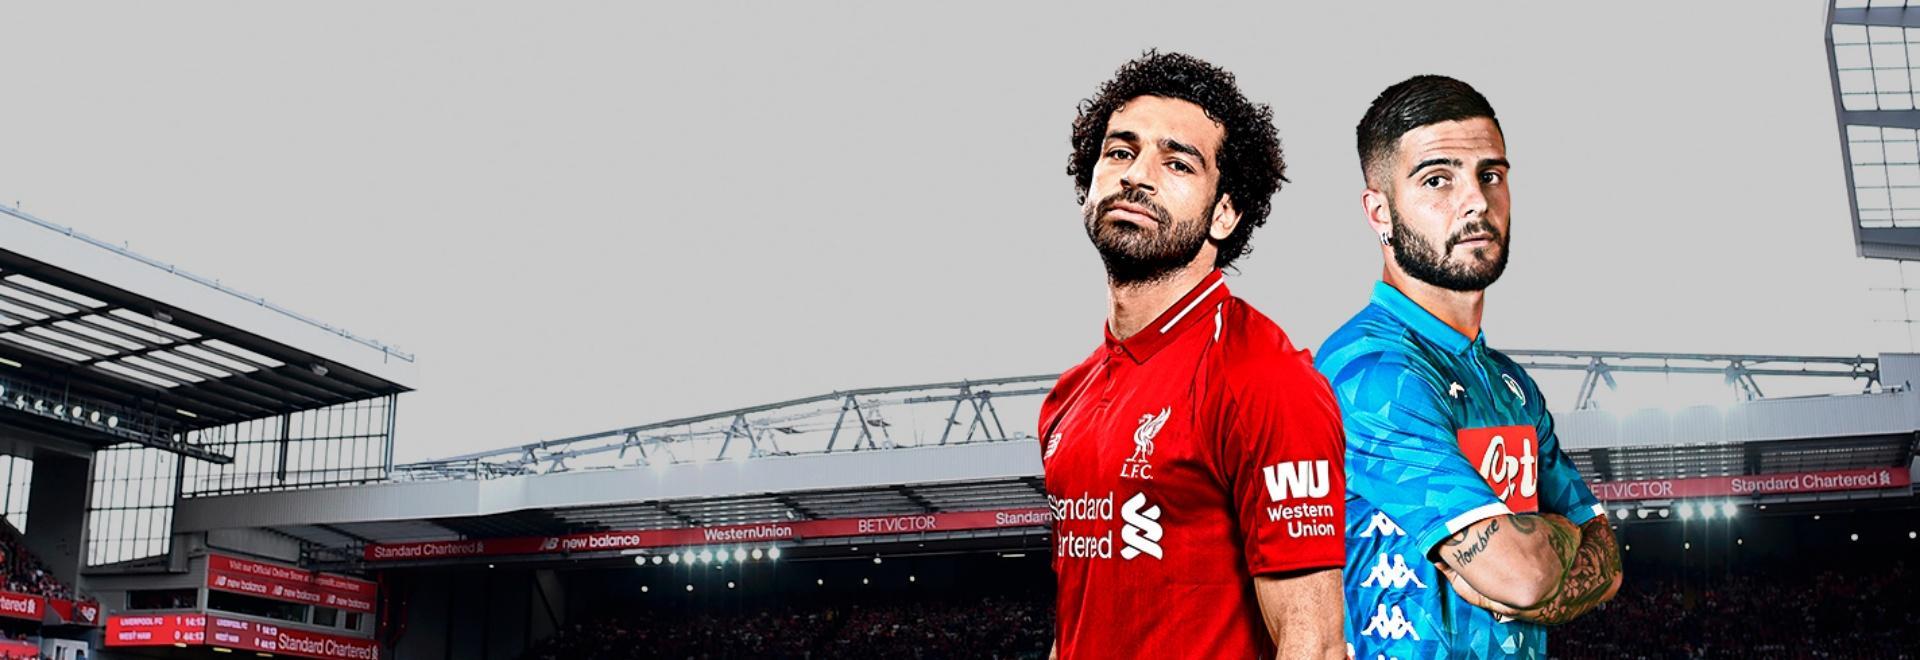 Liverpool - Napoli. 6a g.